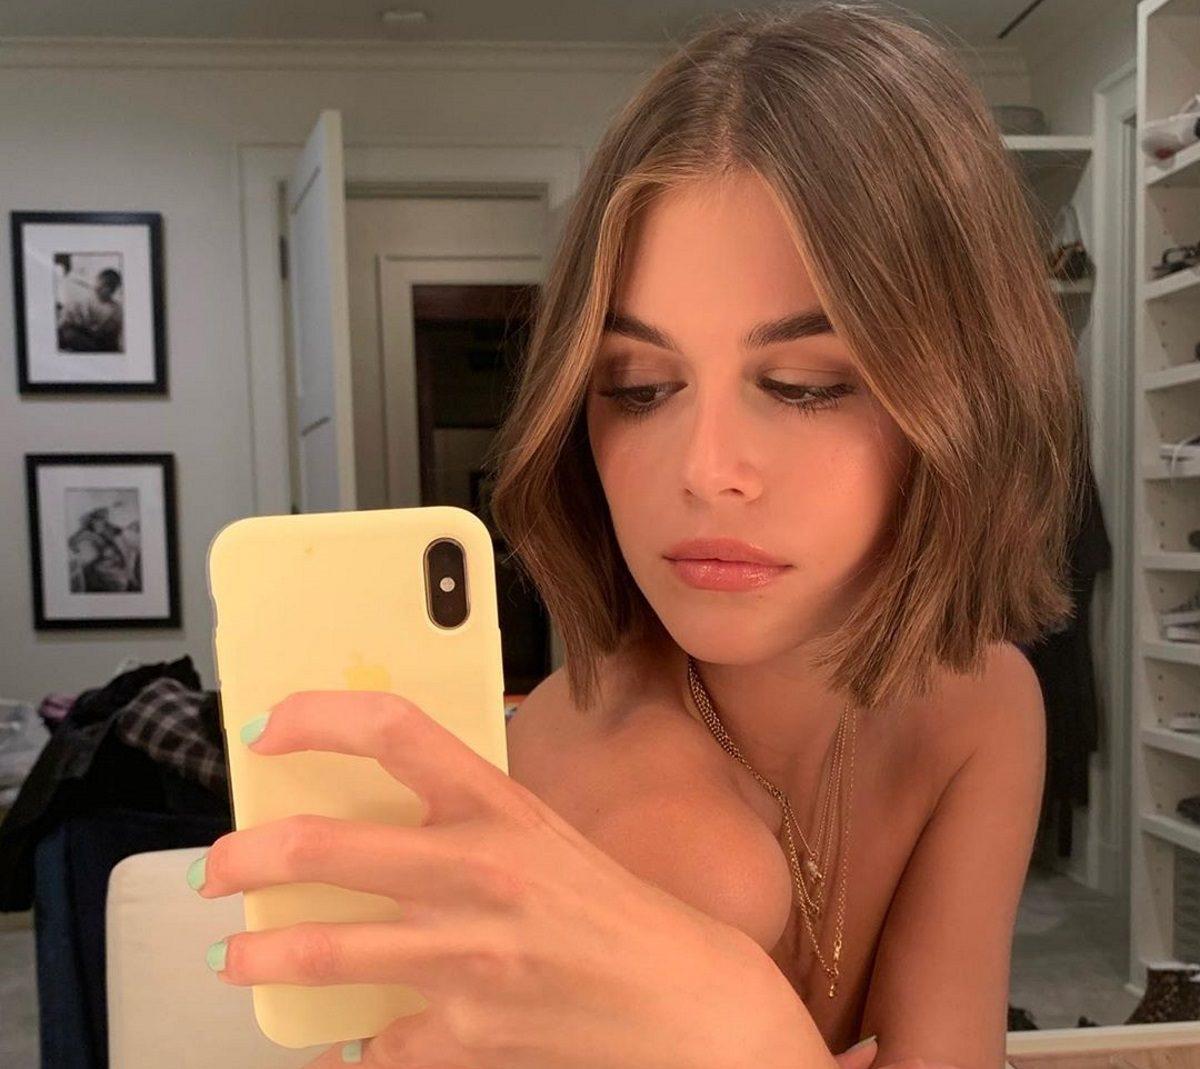 Kaia Gerber: Φήμες για σχέση του super model με τον πρώην αρραβωνιαστικό της Ariana Grande! | tlife.gr